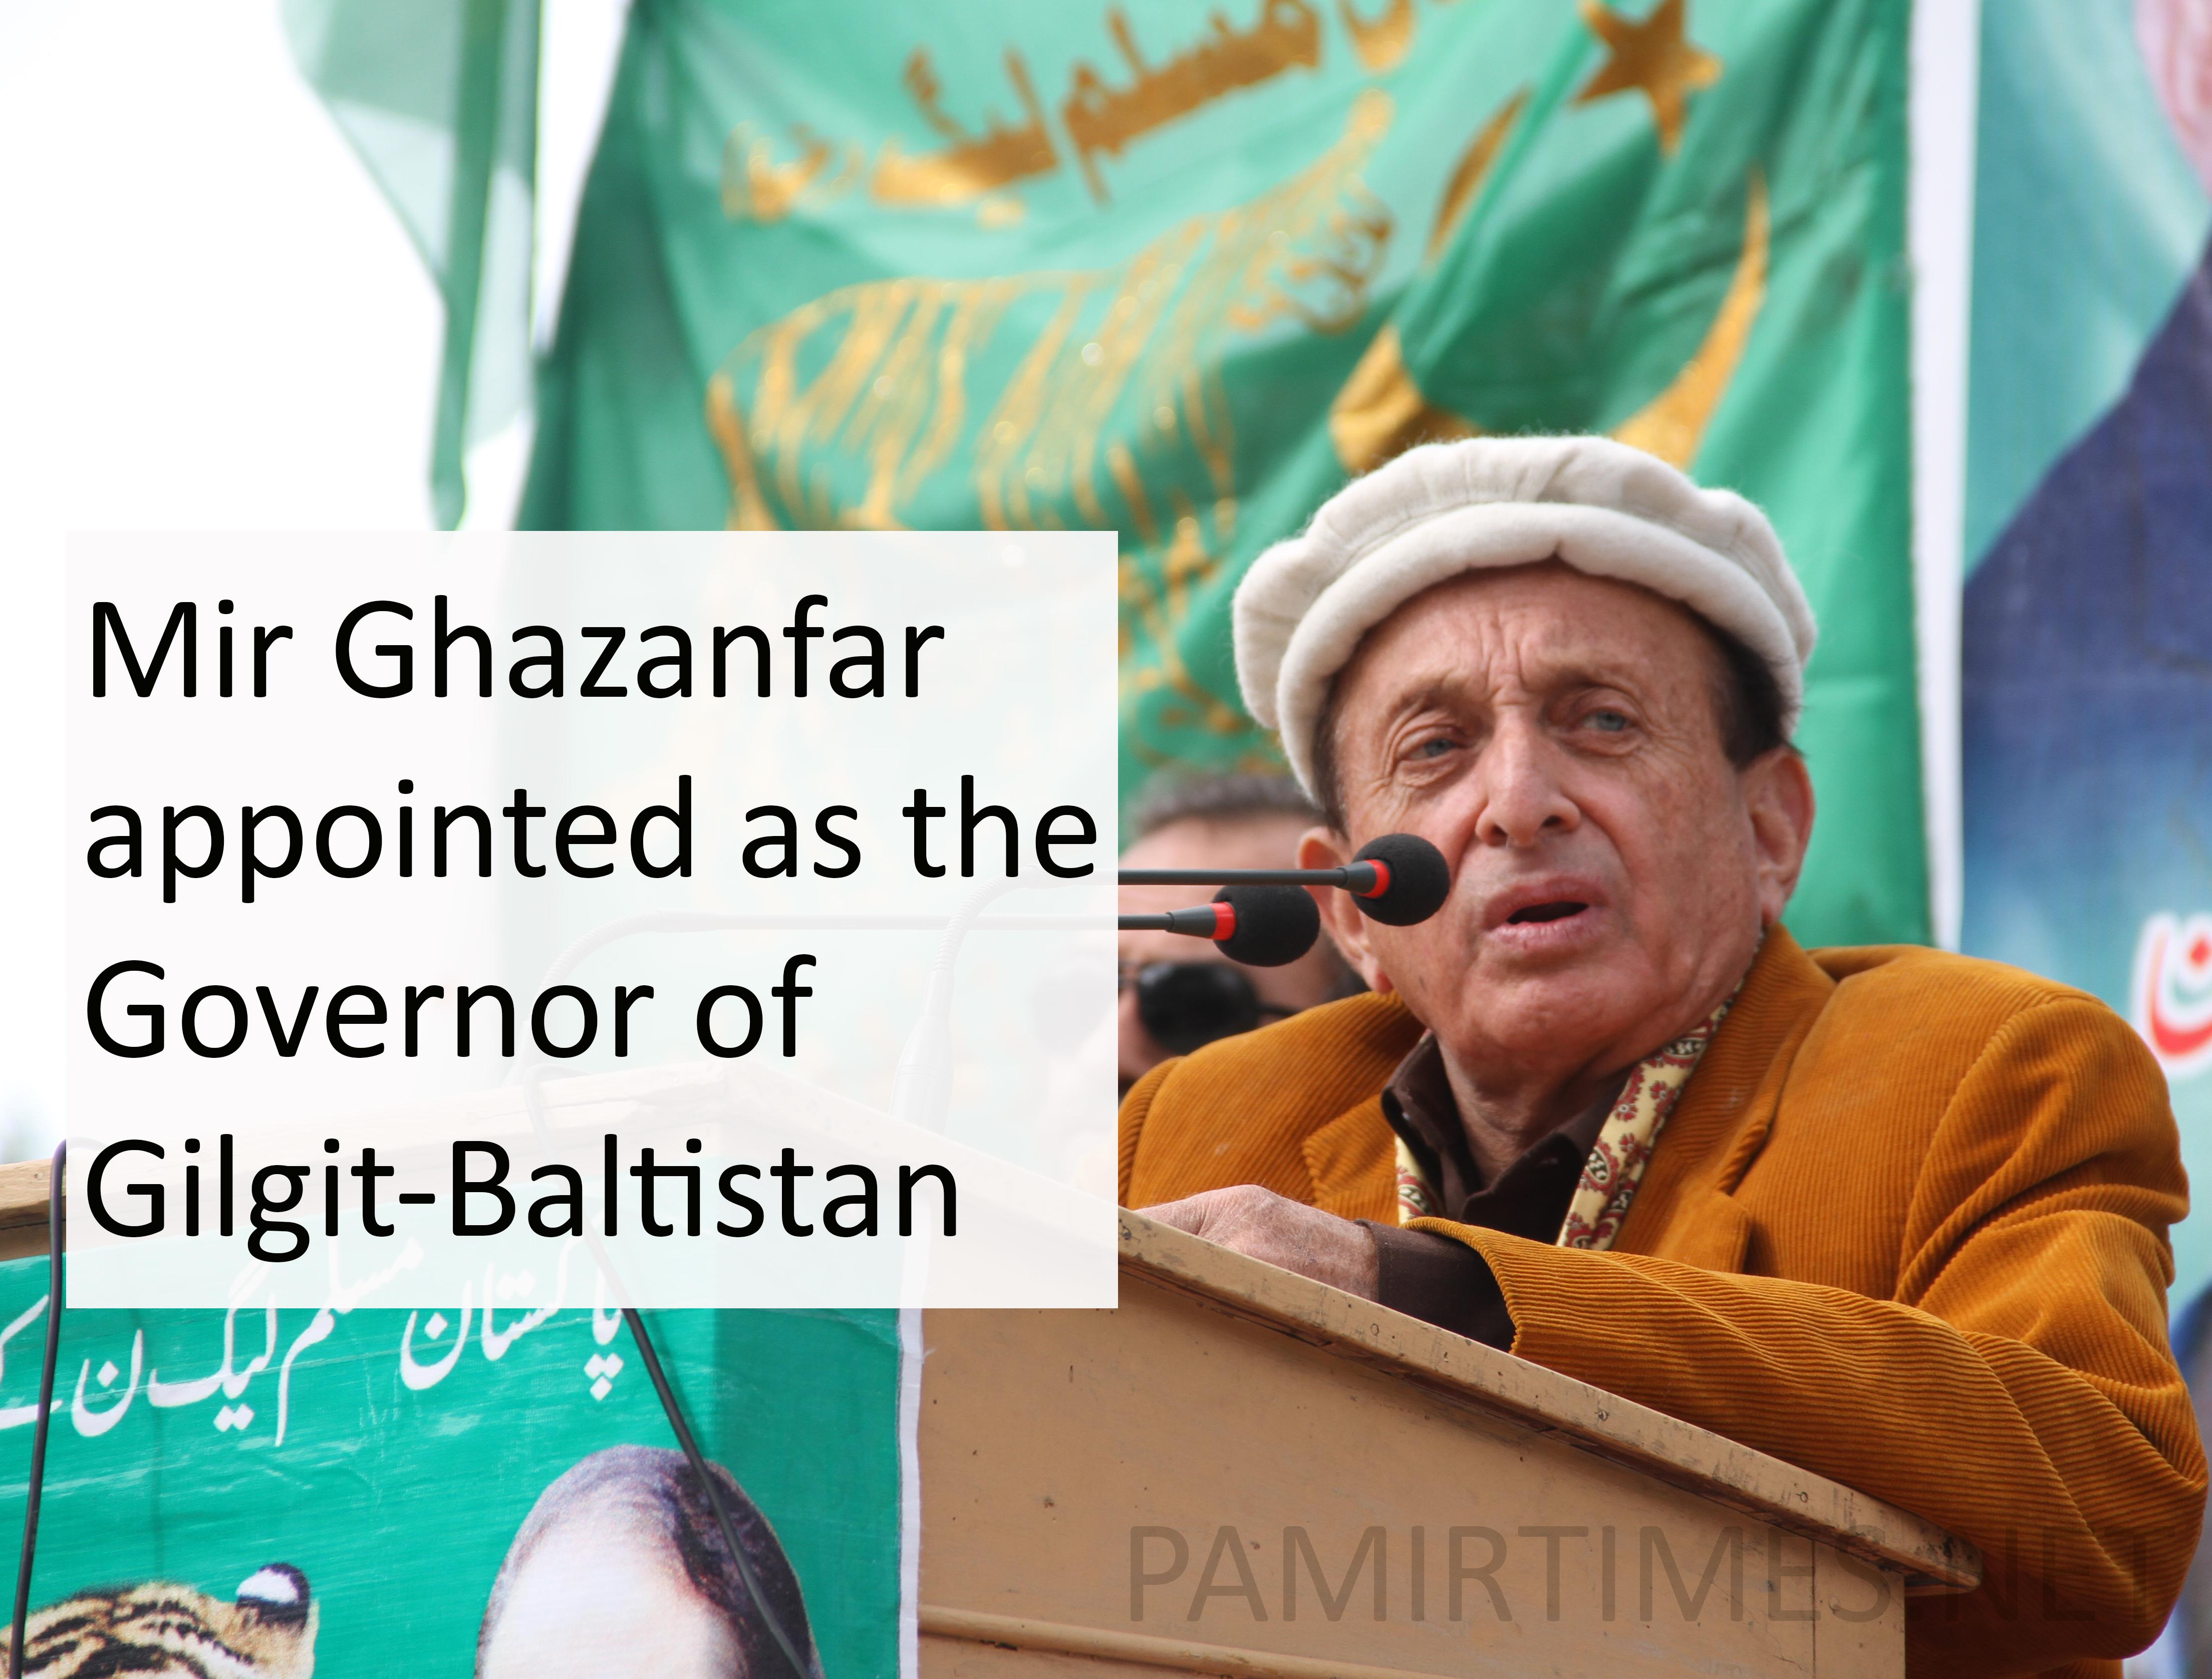 Mir Ghazanfar Ali Khan to be the next Governor of Gilgit-Baltistan